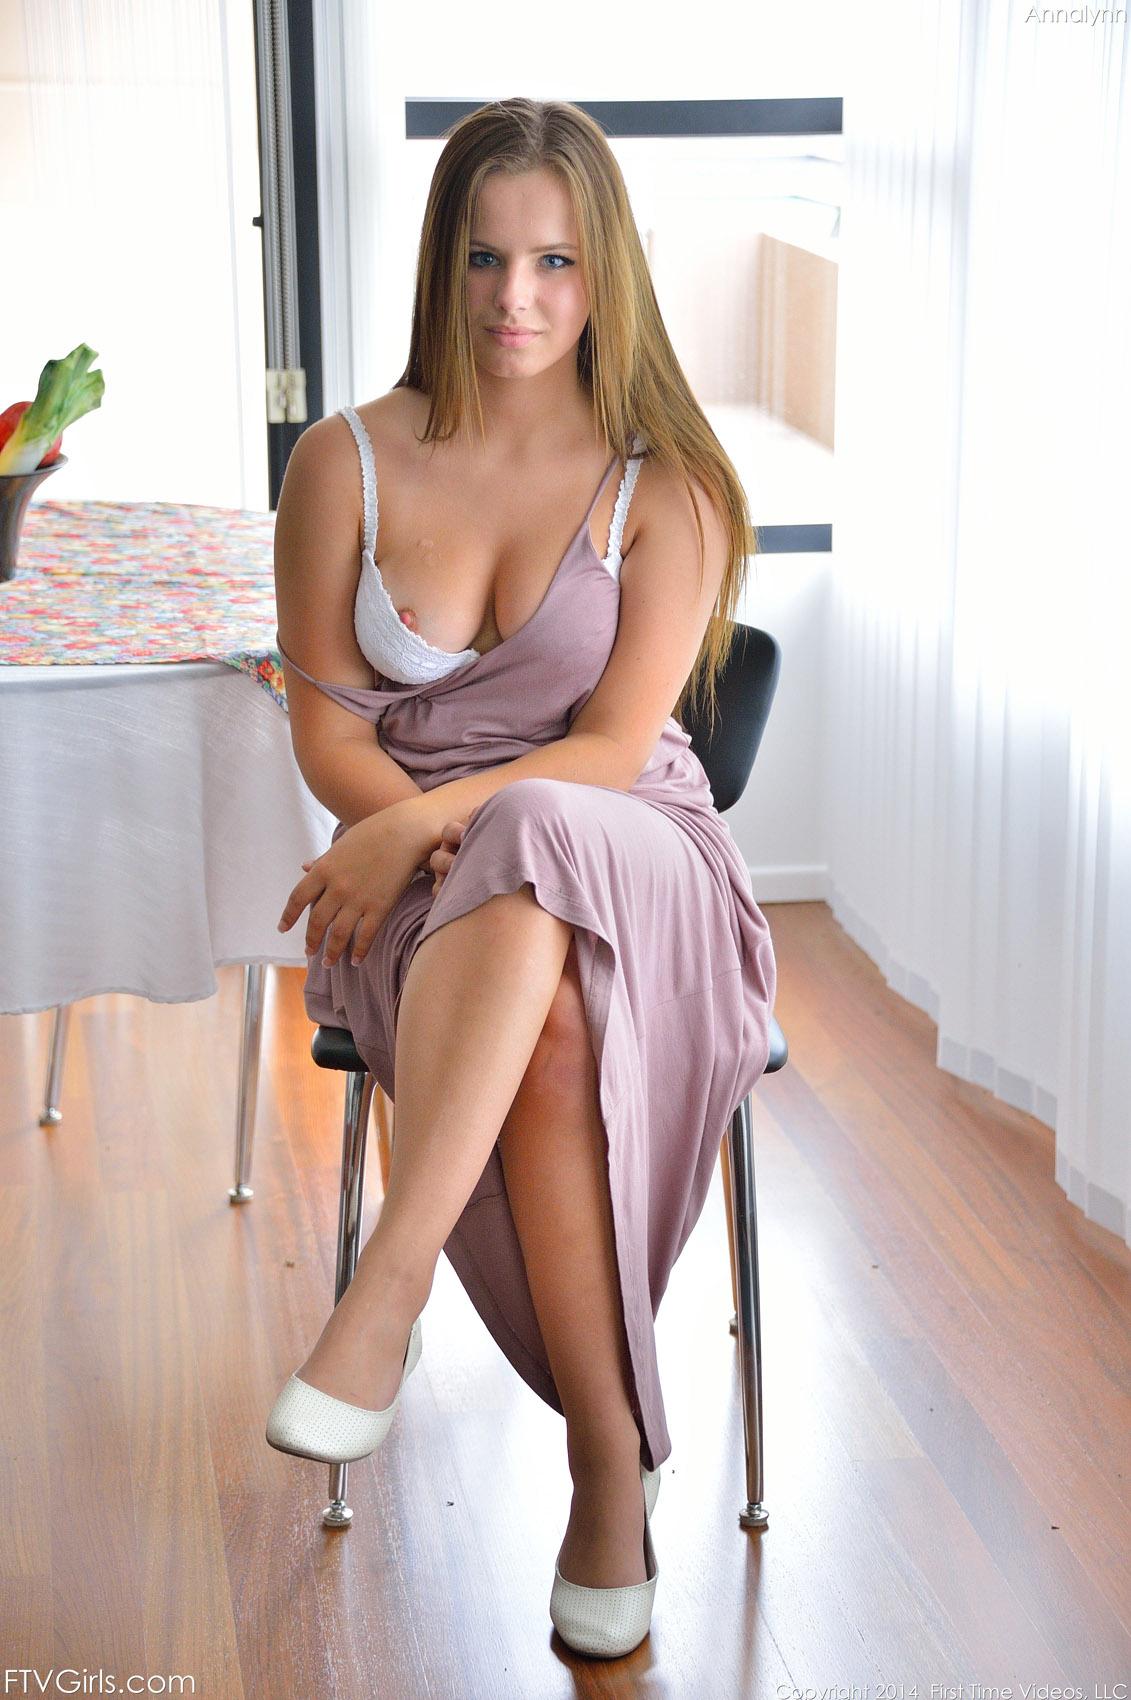 Anna Lynn Porn annalynn ftv bubble butt / hotty stop